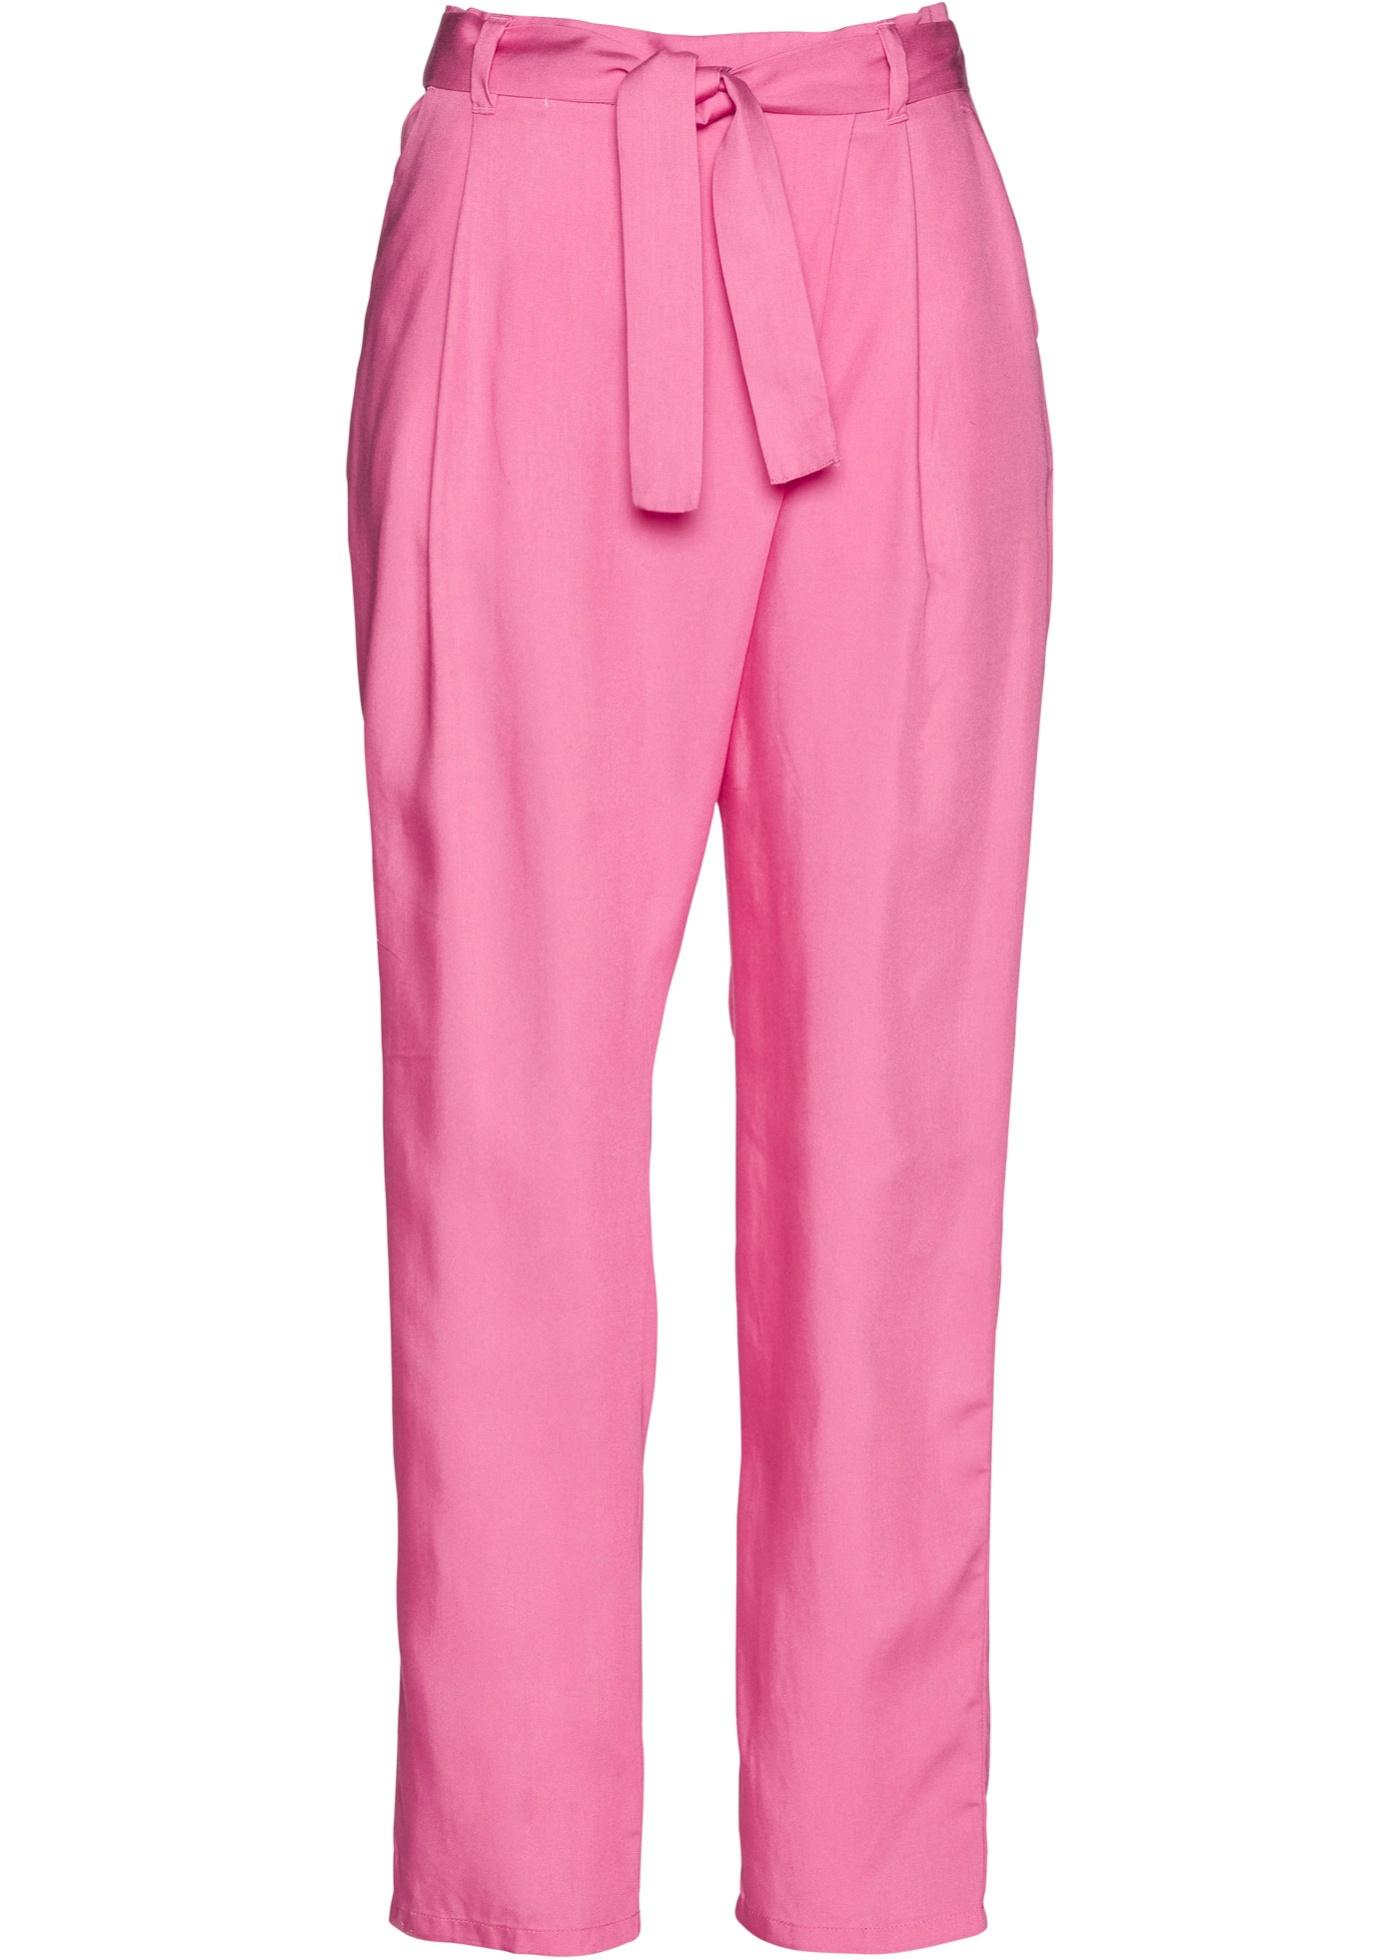 Tencel lyocell-bukse med legg på linningen